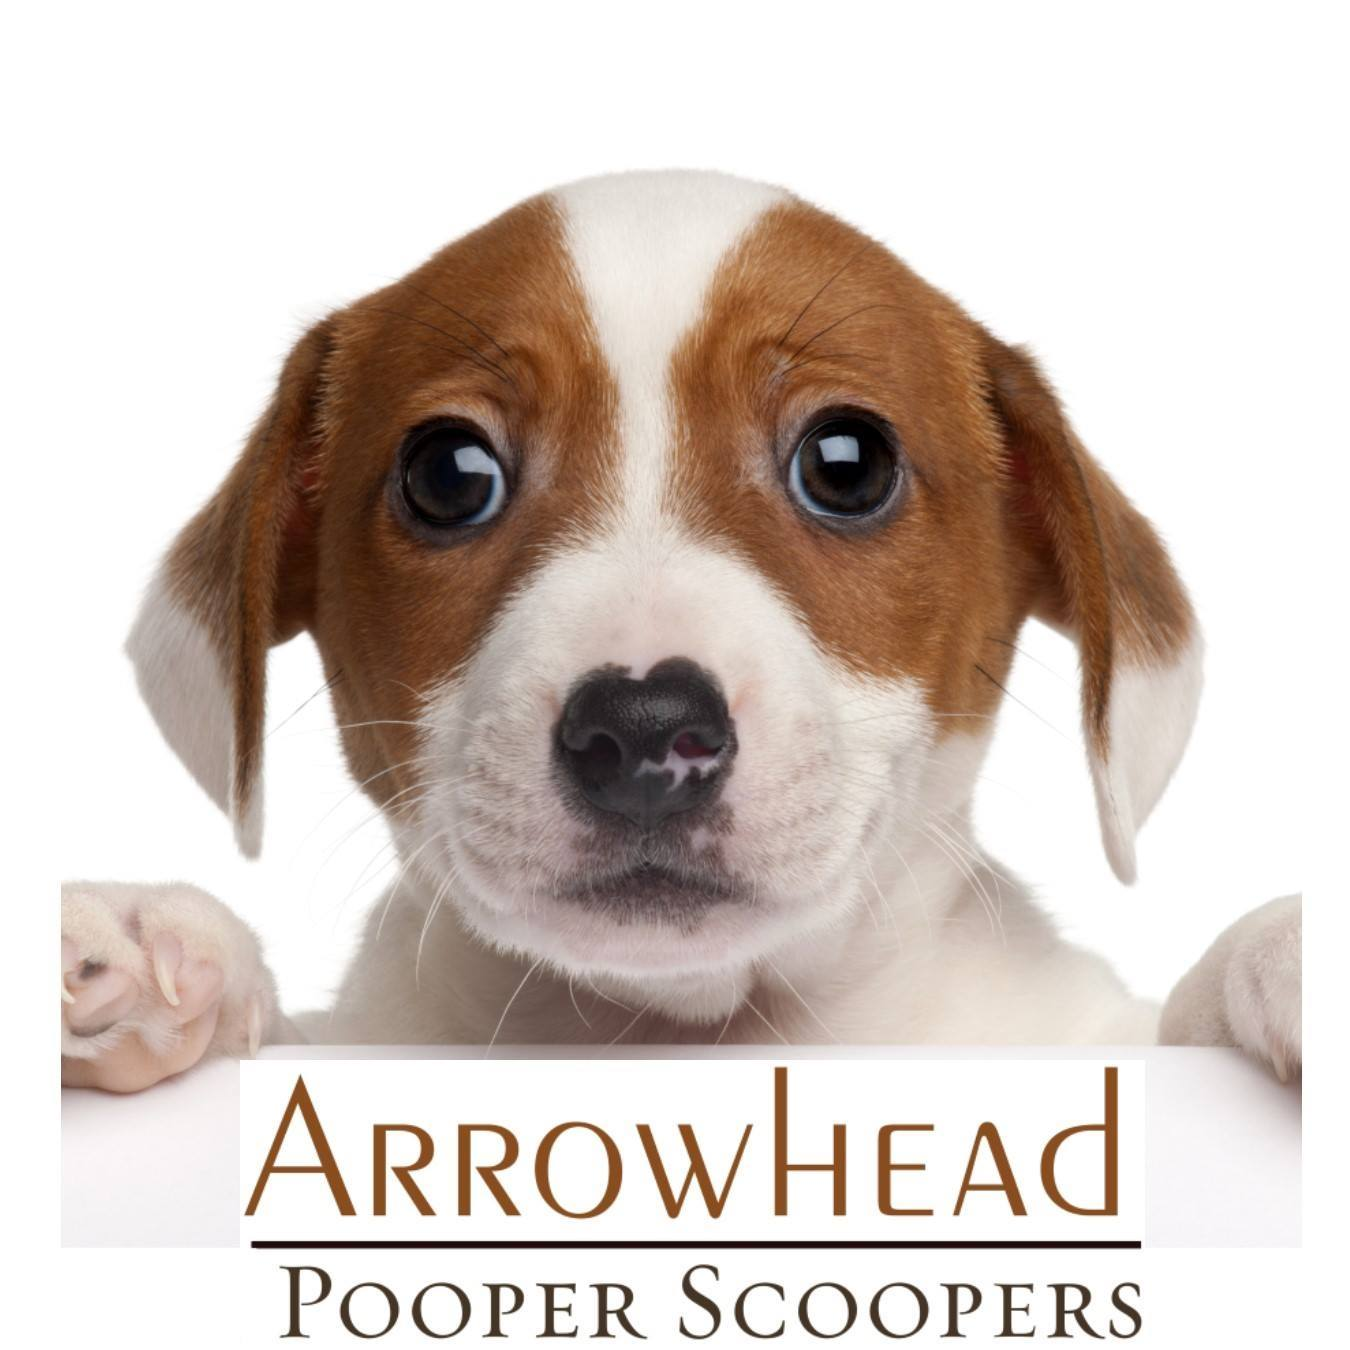 Arrowhead Pooper Scoopers